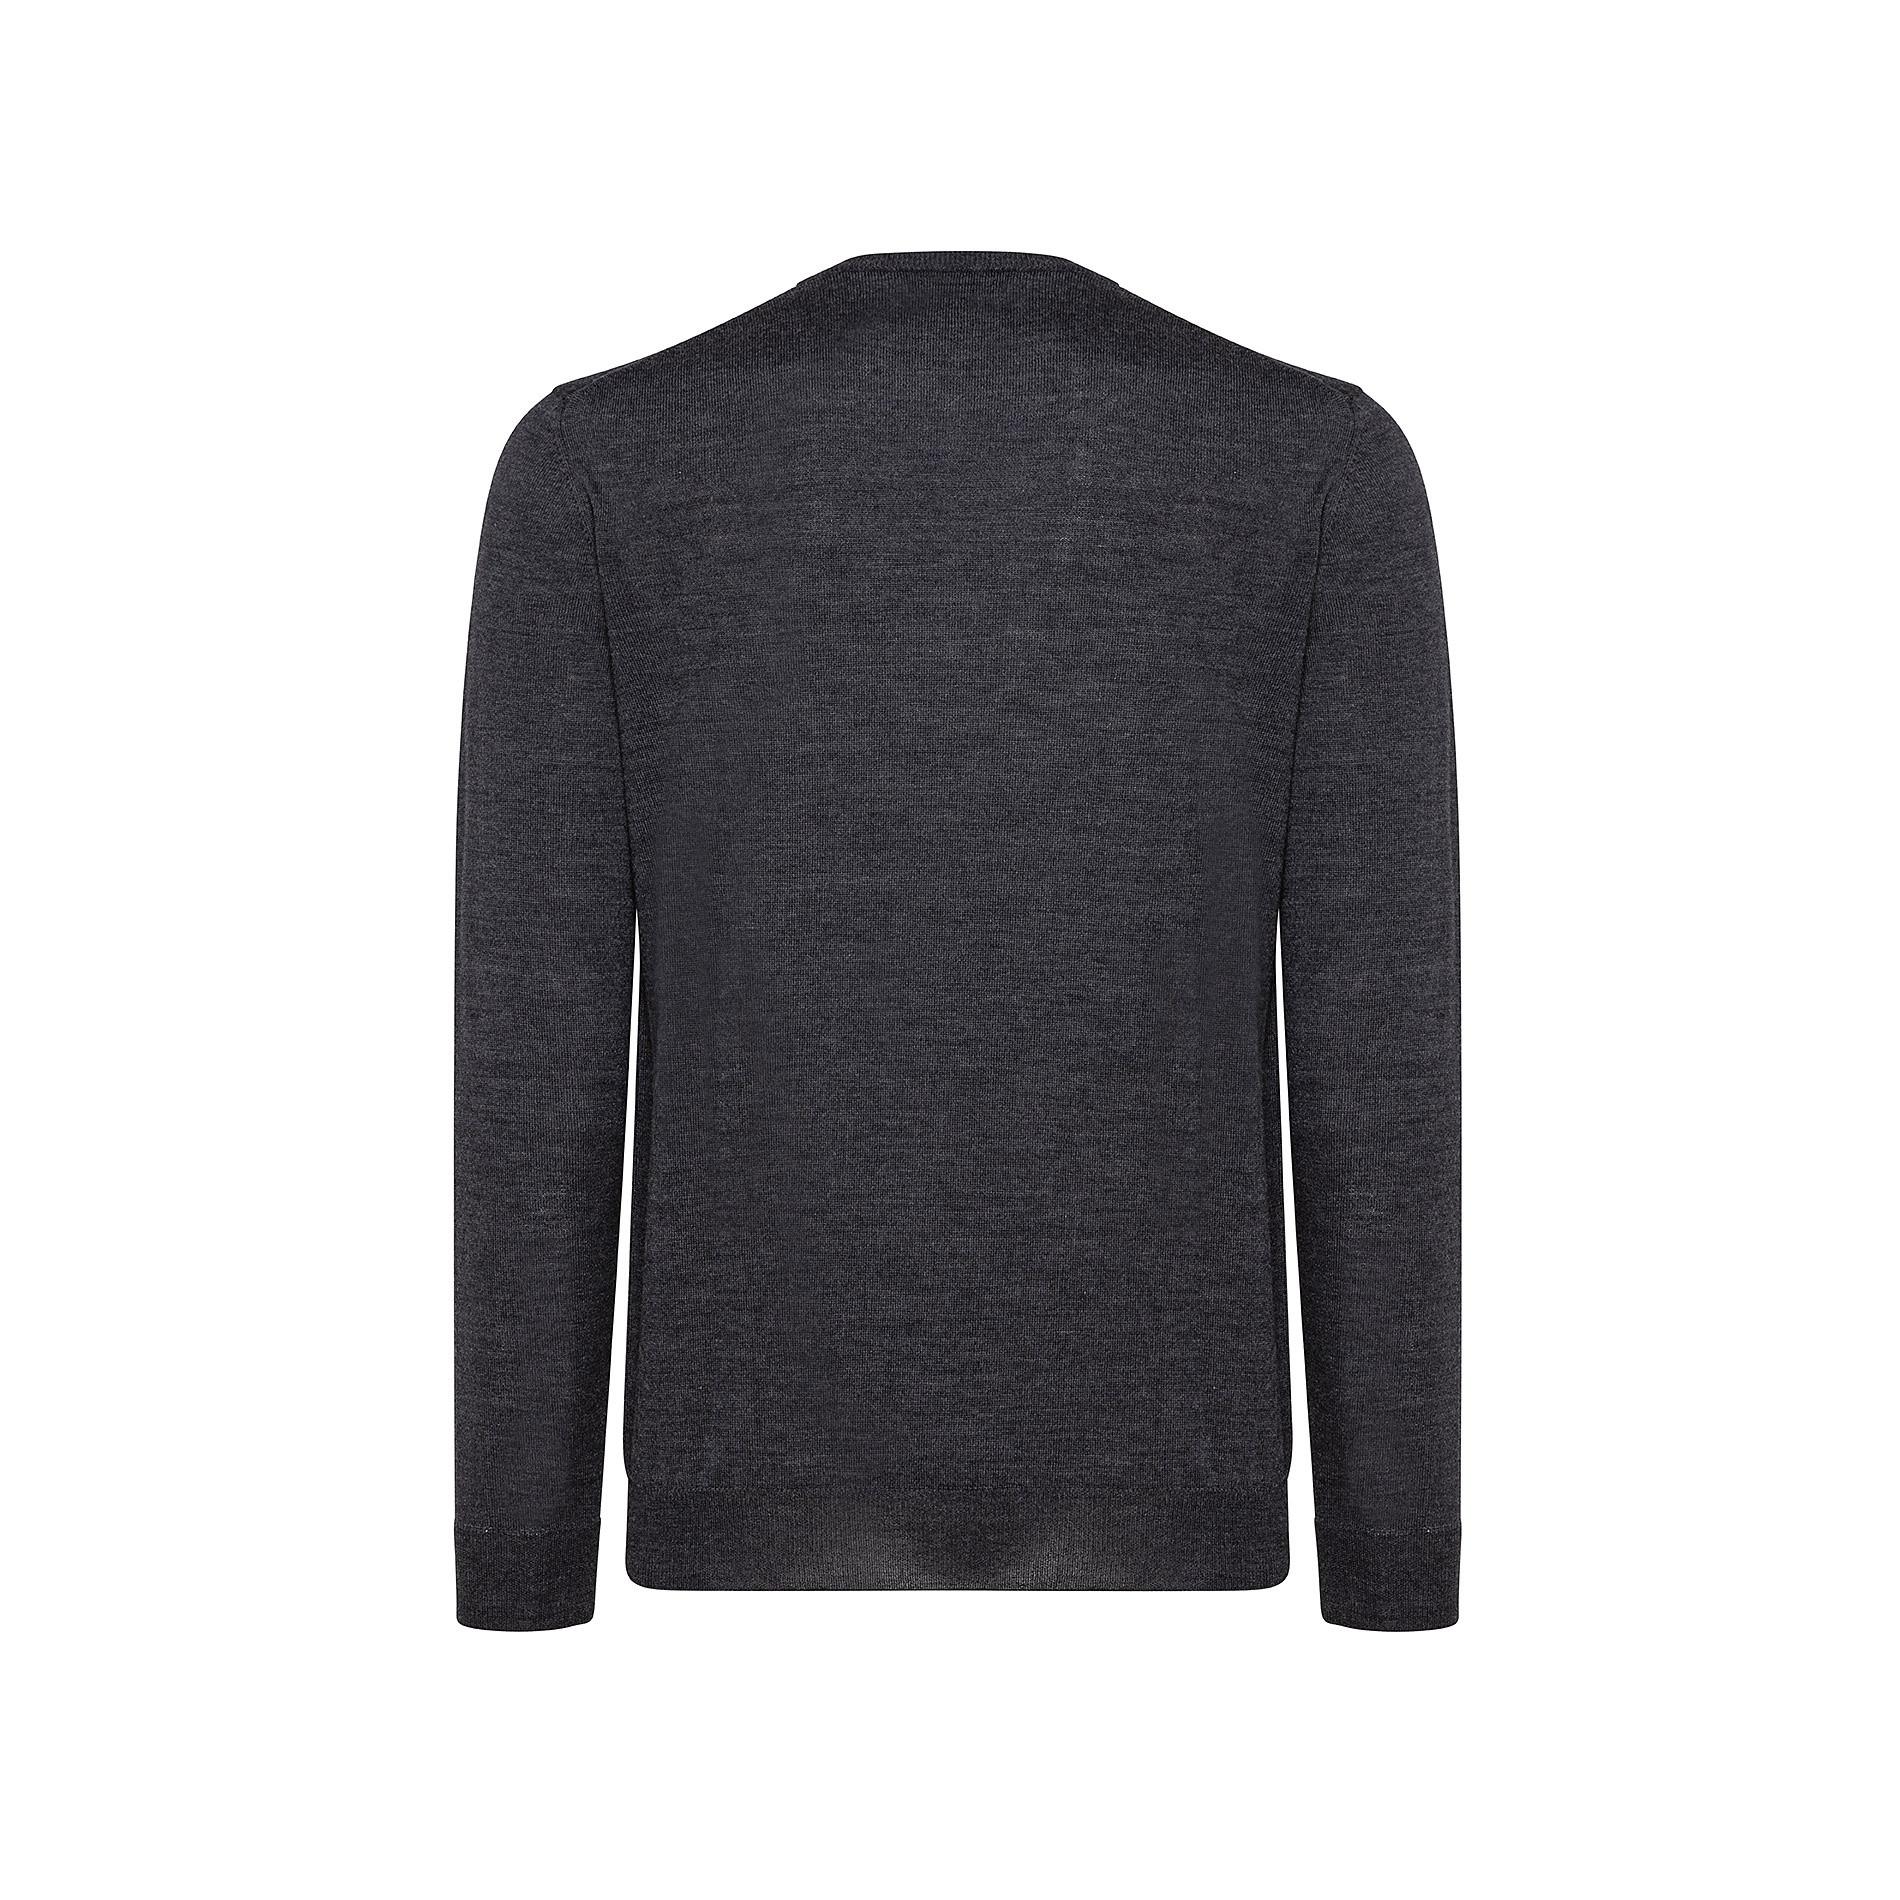 Pullover girocollo lana merinos extrafine, Grigio chiaro, large image number 1